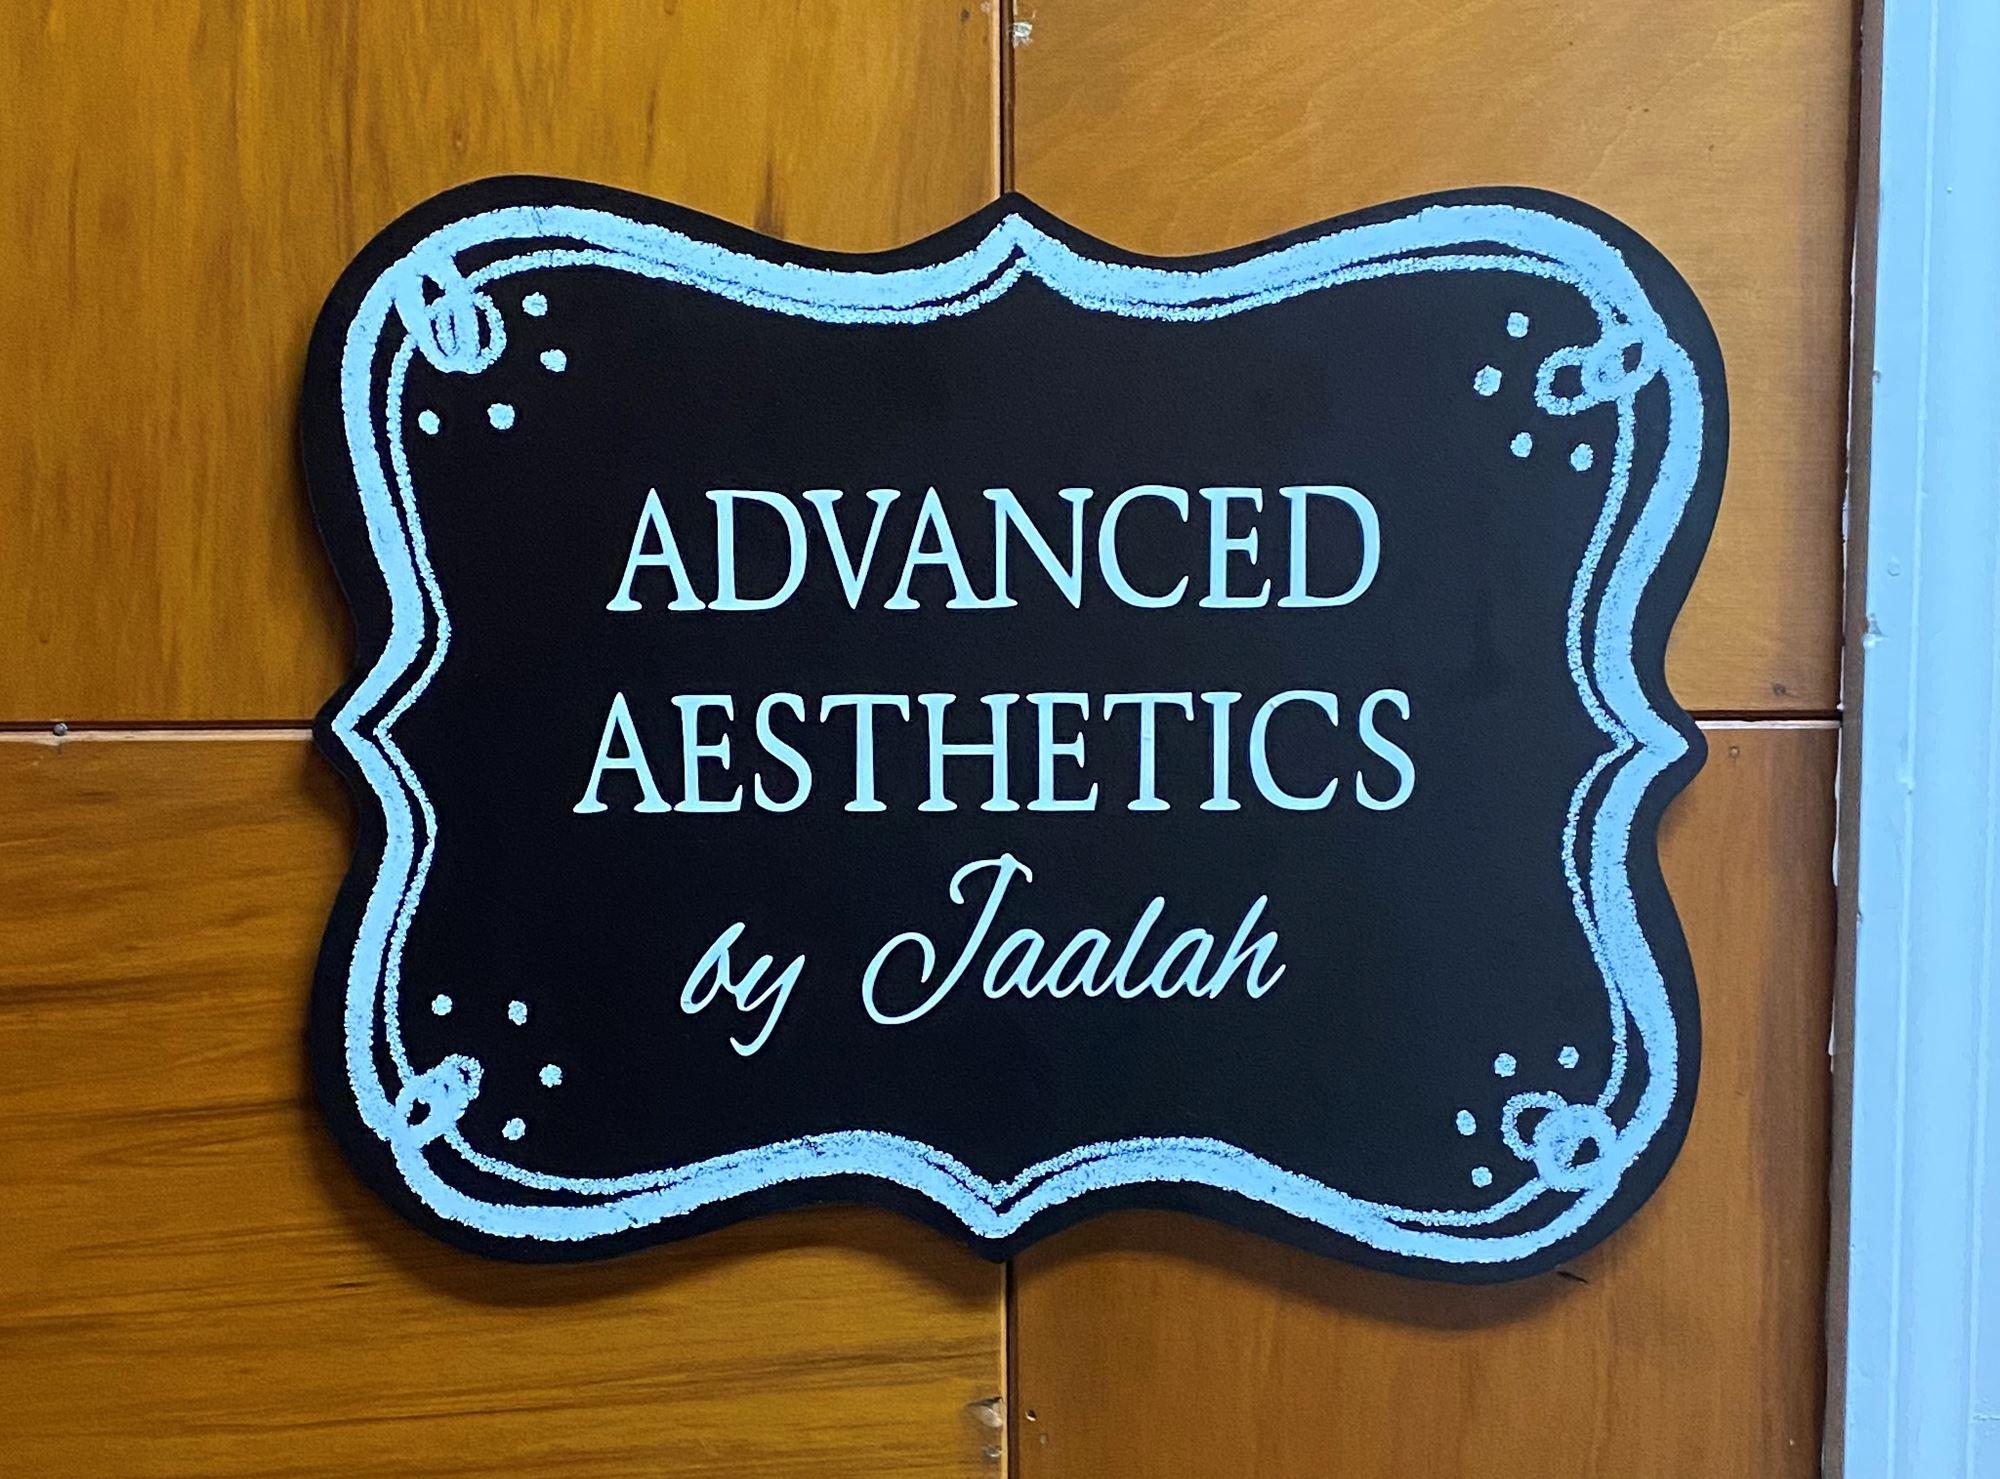 Advanced Aesthetics by Jaalah